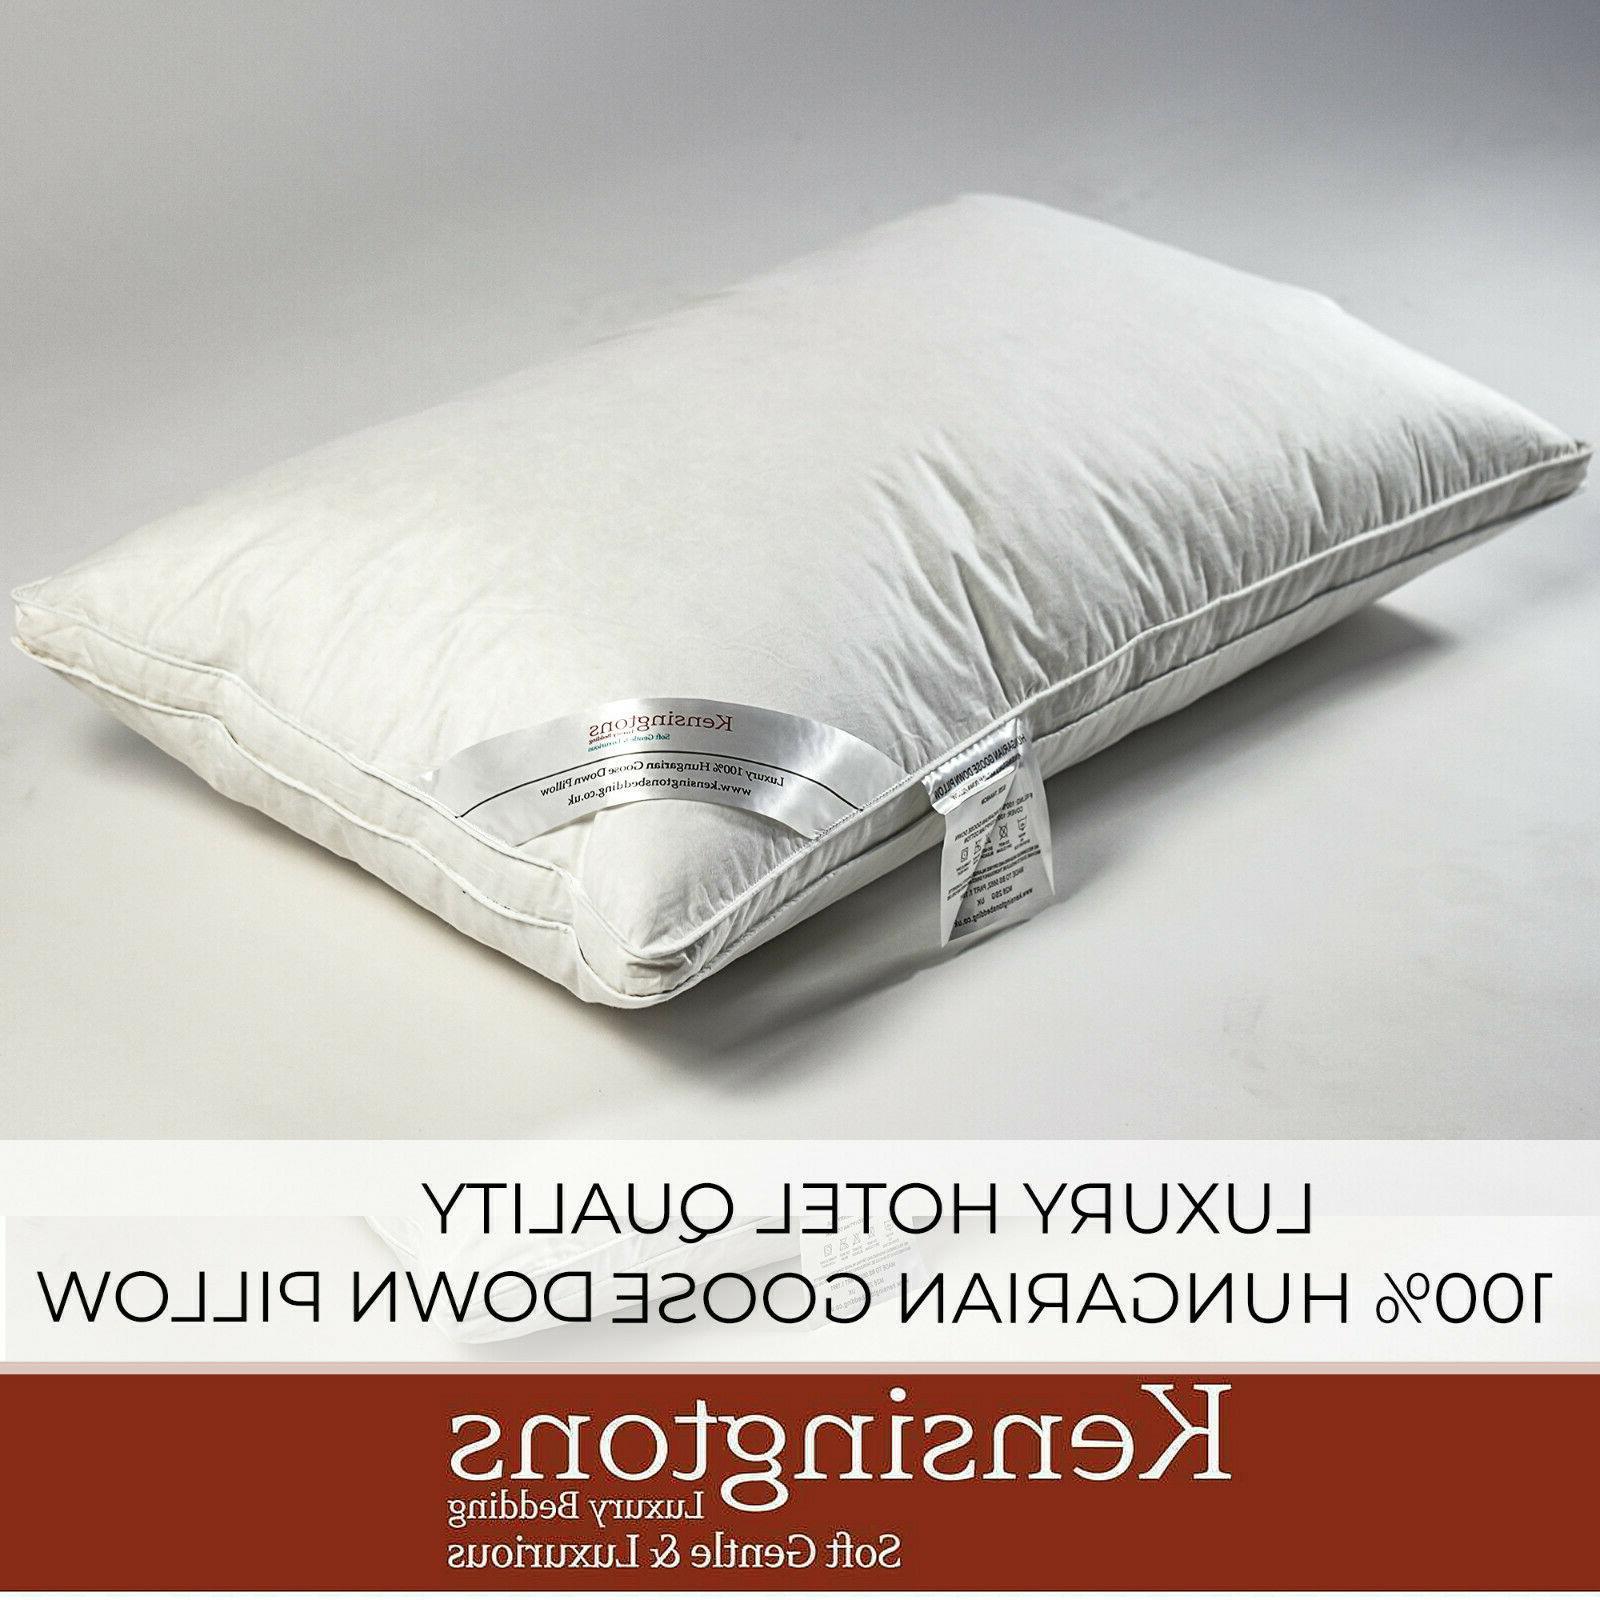 100 percent pure hungarian goose down pillows